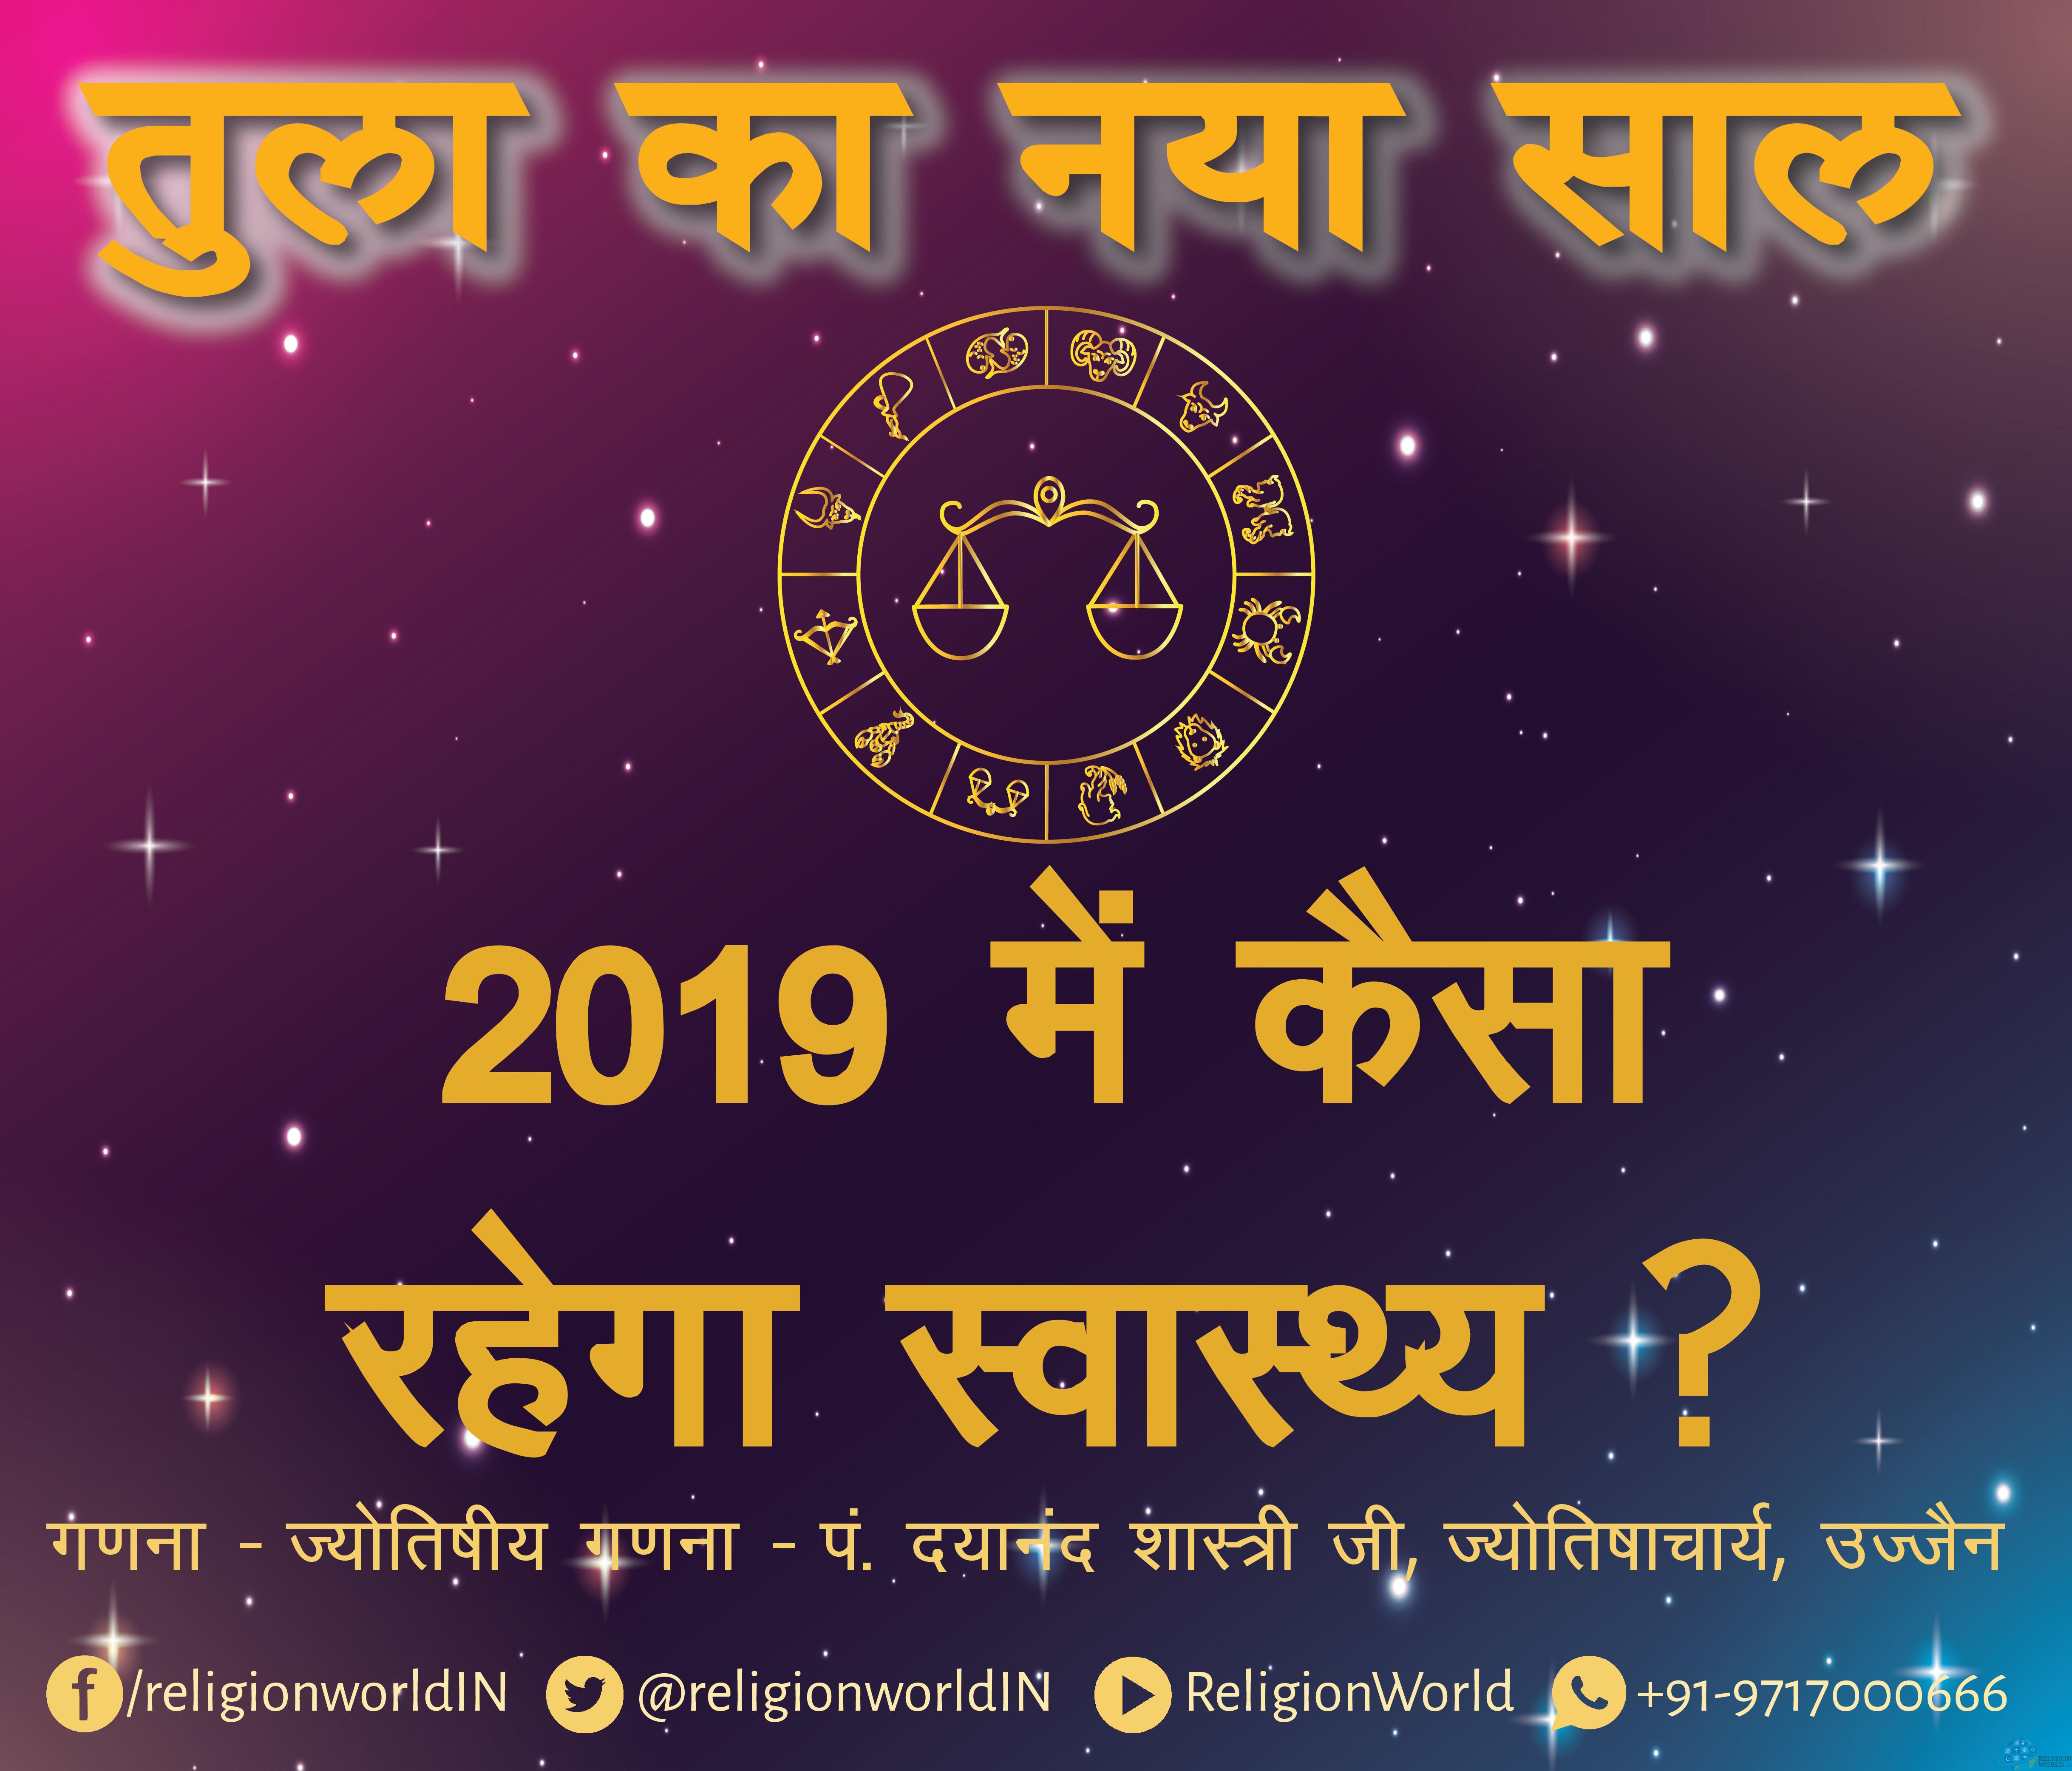 Yearly Prediction, तुला राशि, वार्षिक राशिफल, Libra, Horoscope 2019